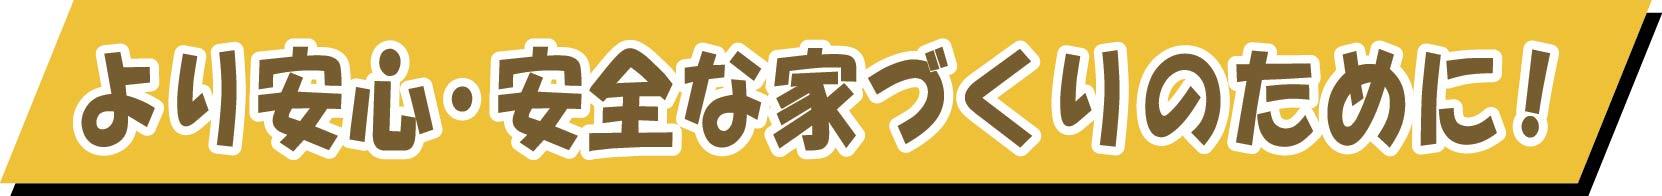 KuraSi-natu-sin84-08.jpg